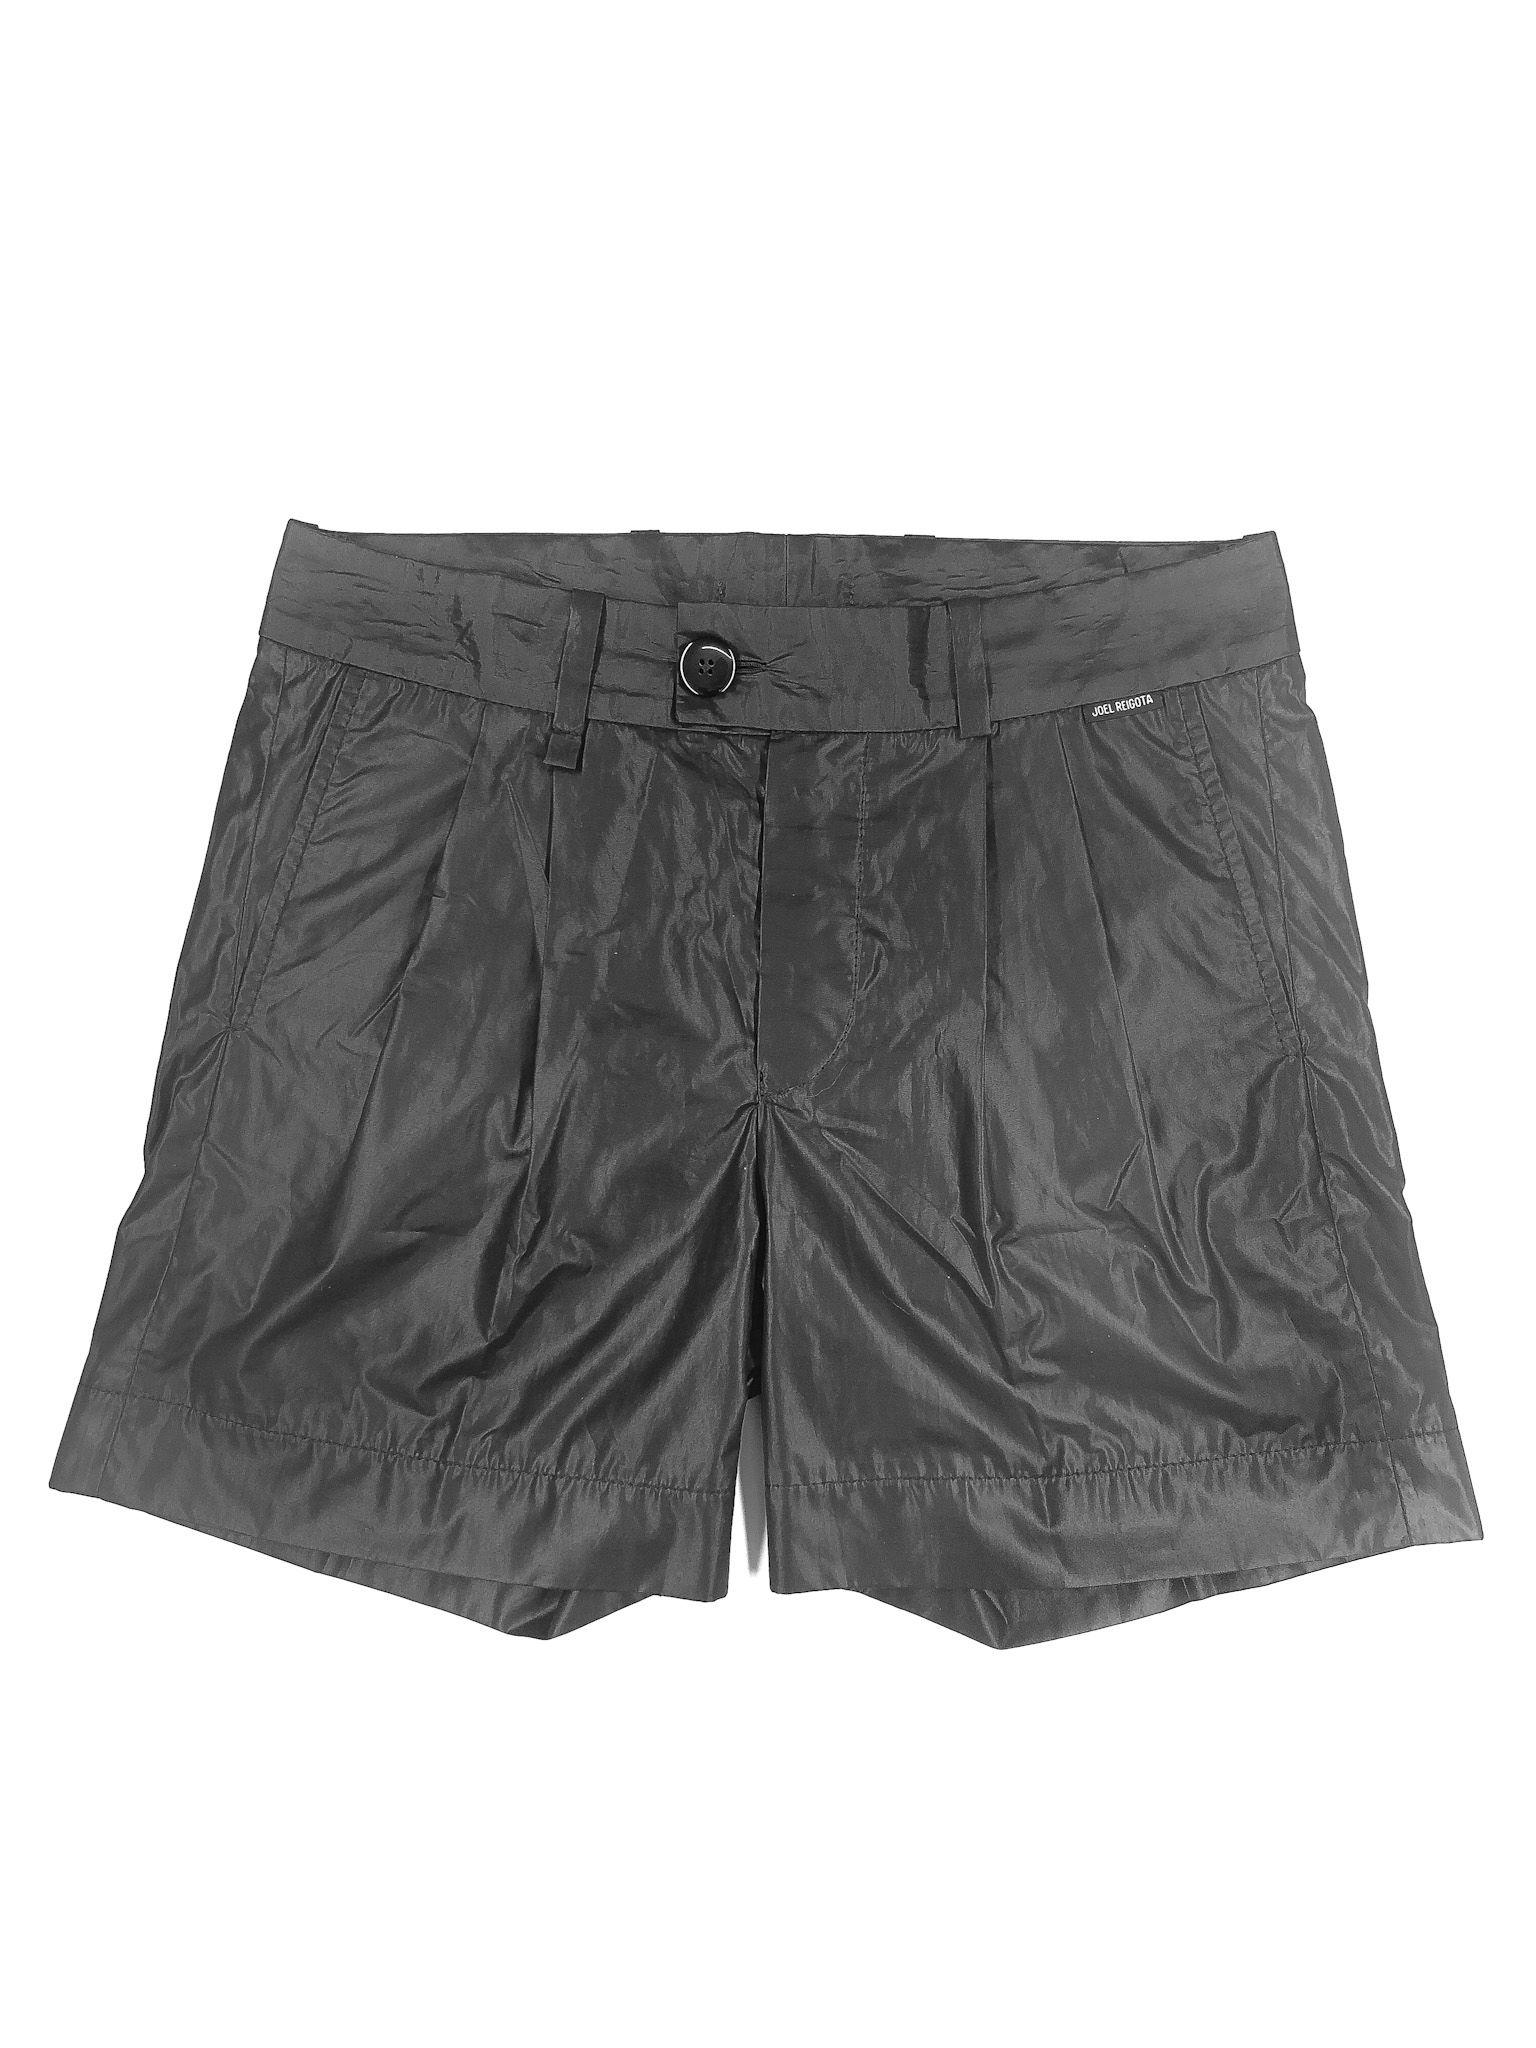 Black Wrinkled Shorts